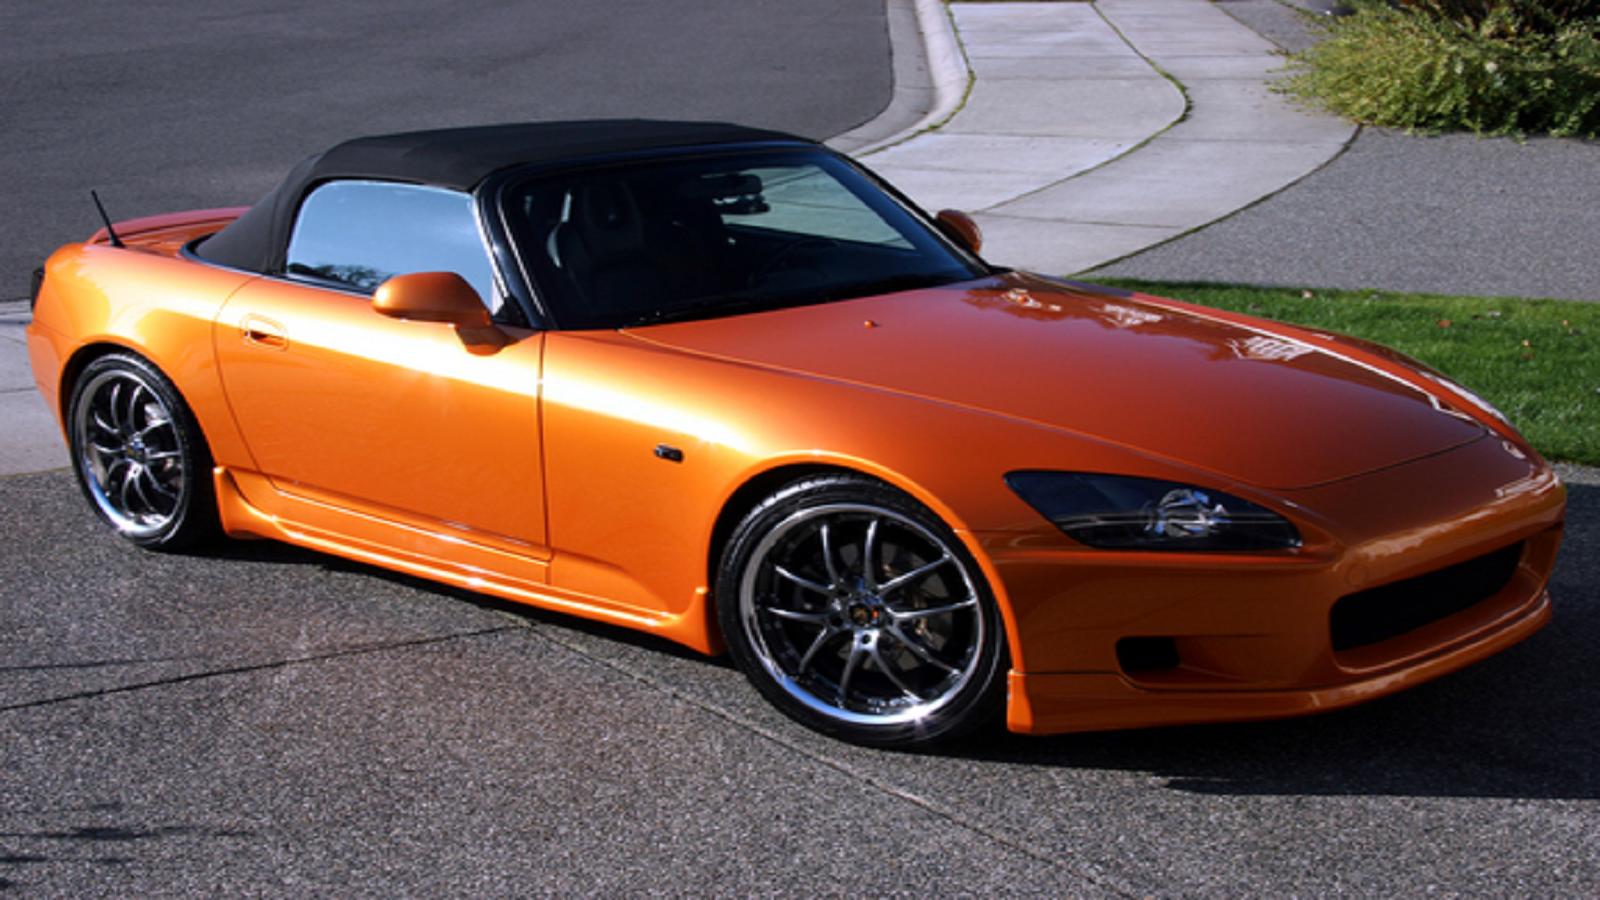 Imola Orange S2000